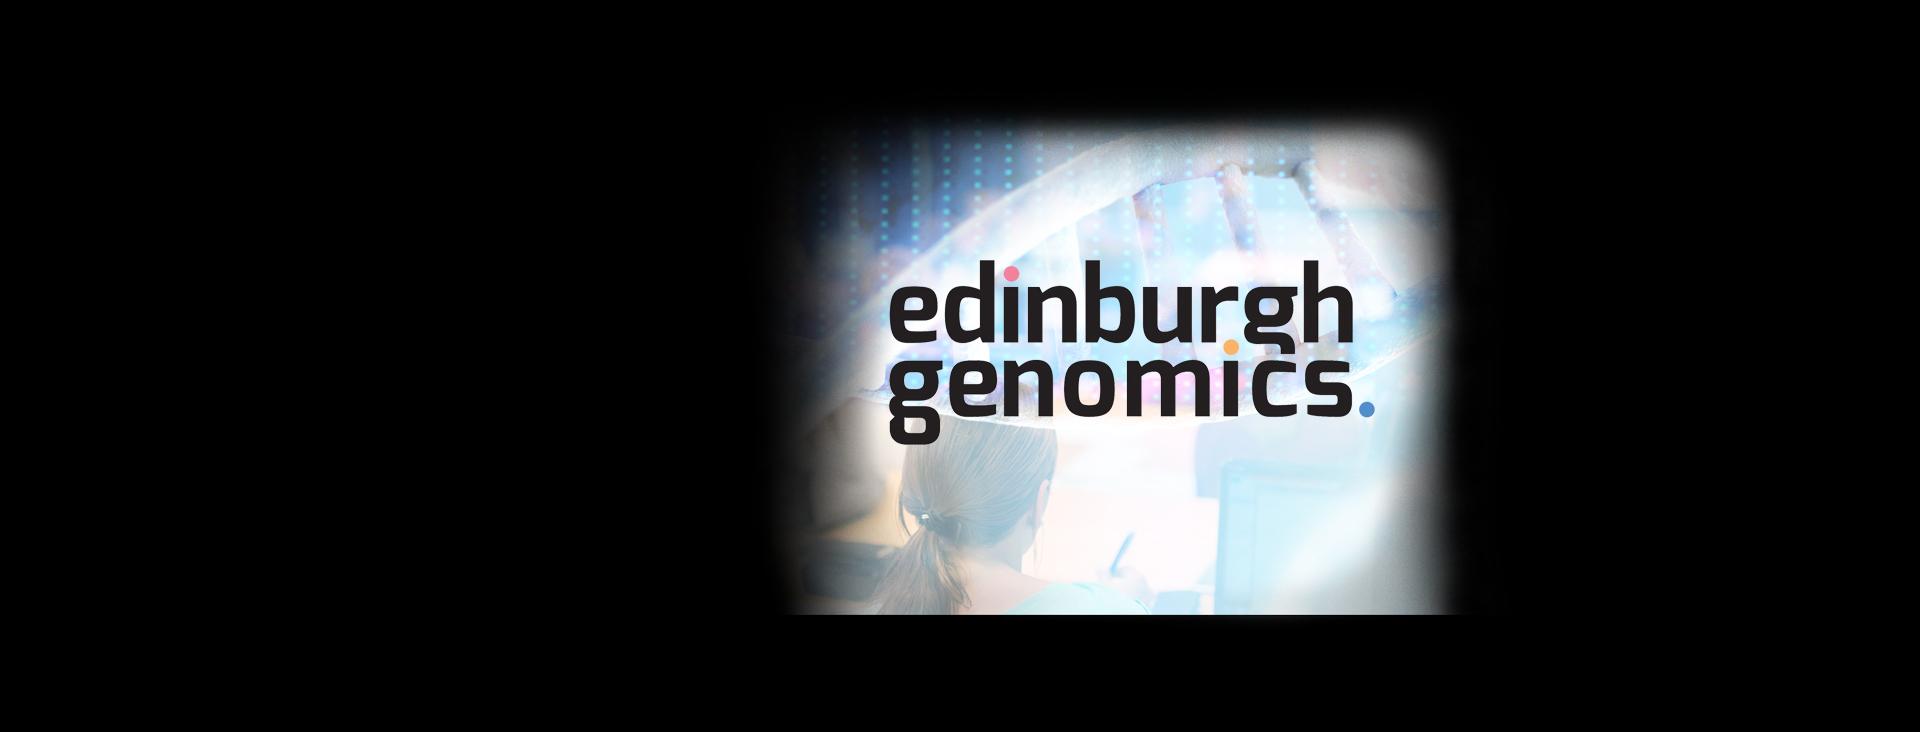 Edinburgh Genomics Homepage Banner